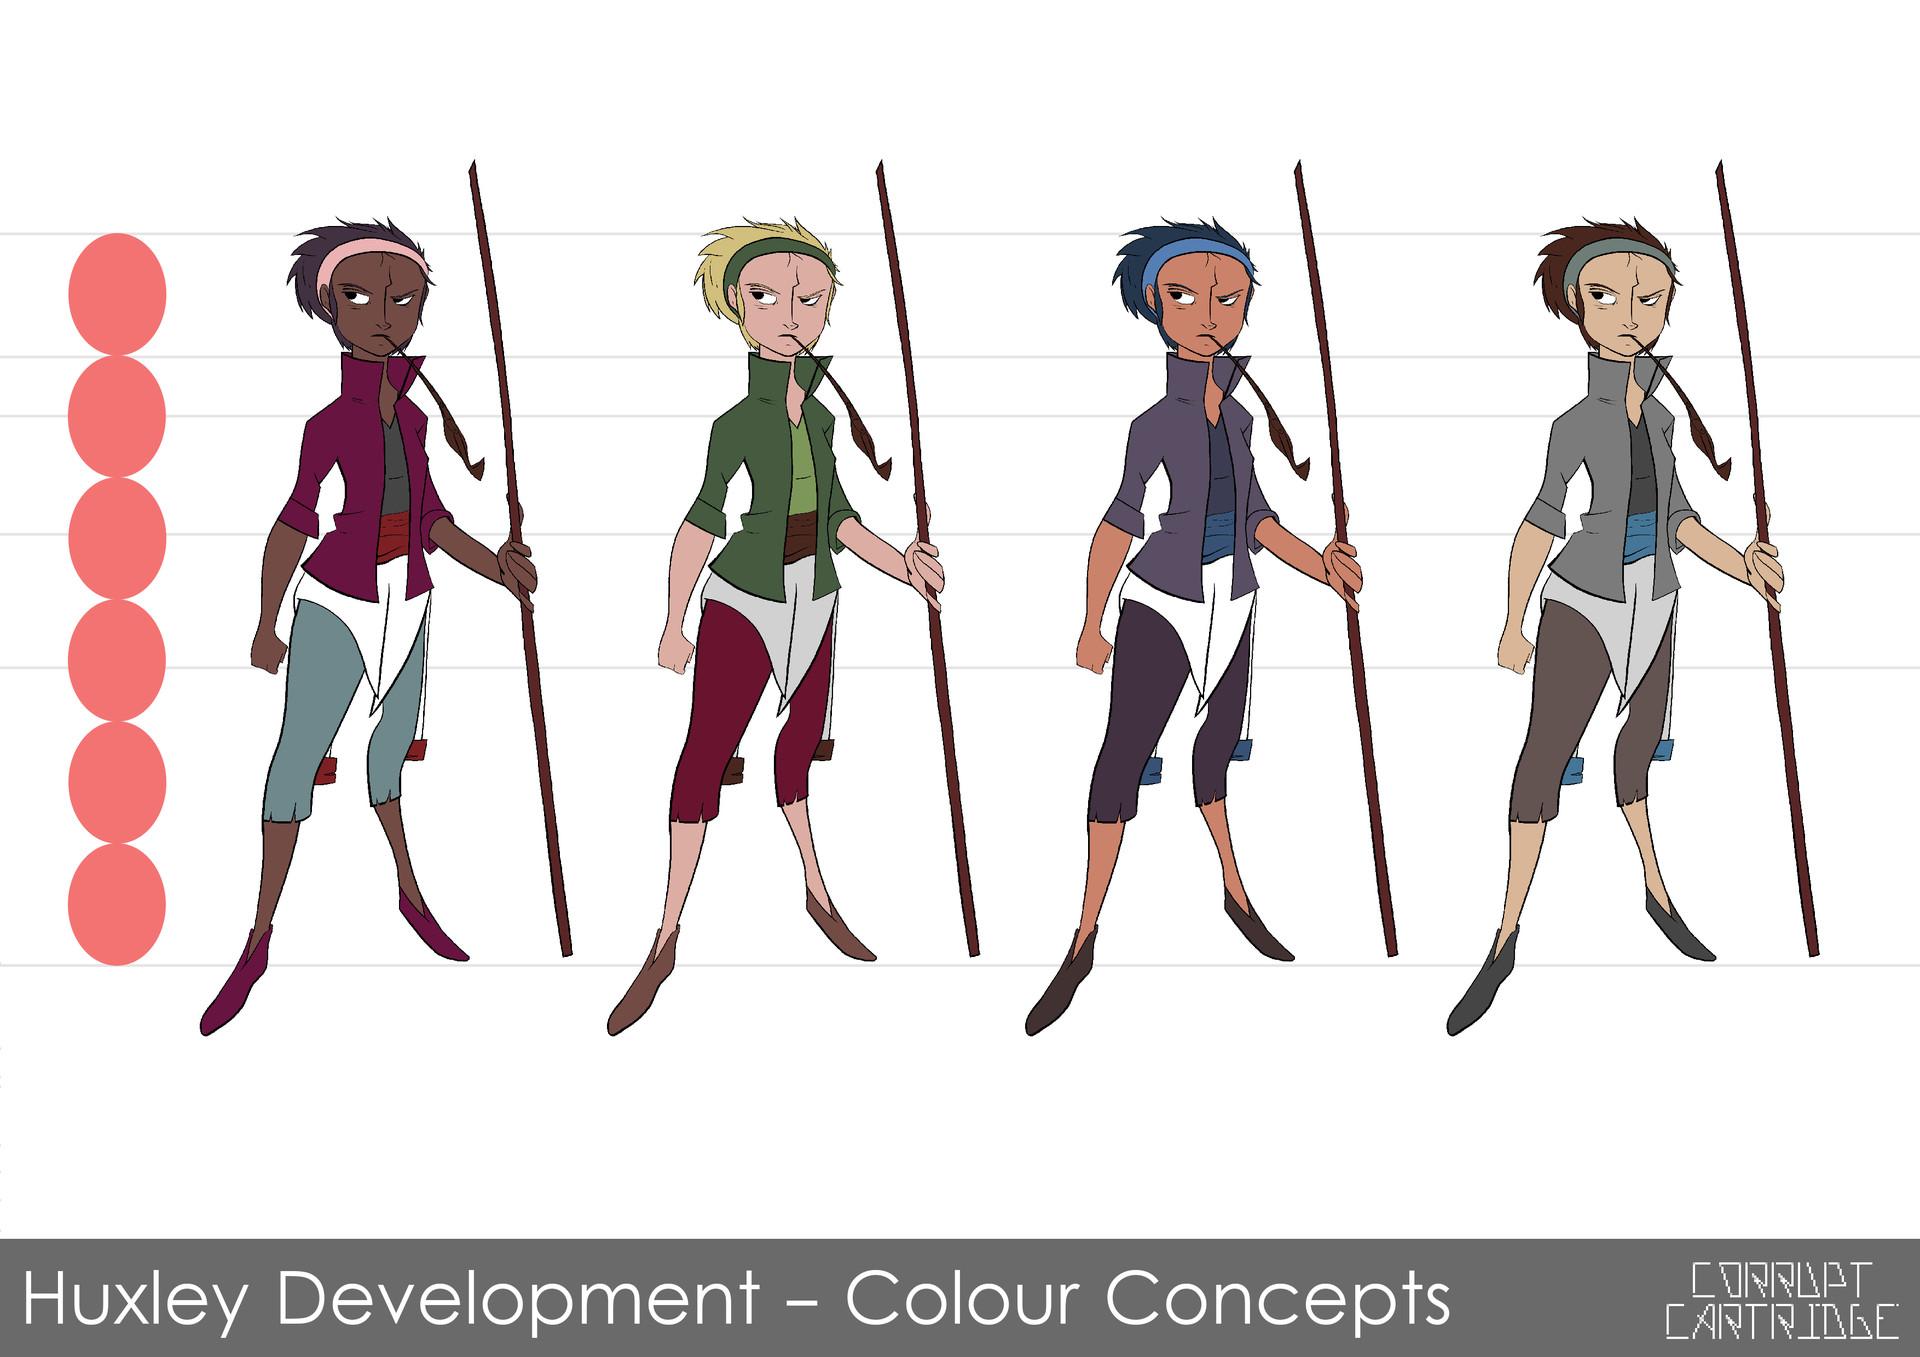 Craig mullins 08 huxley colour concepts 01